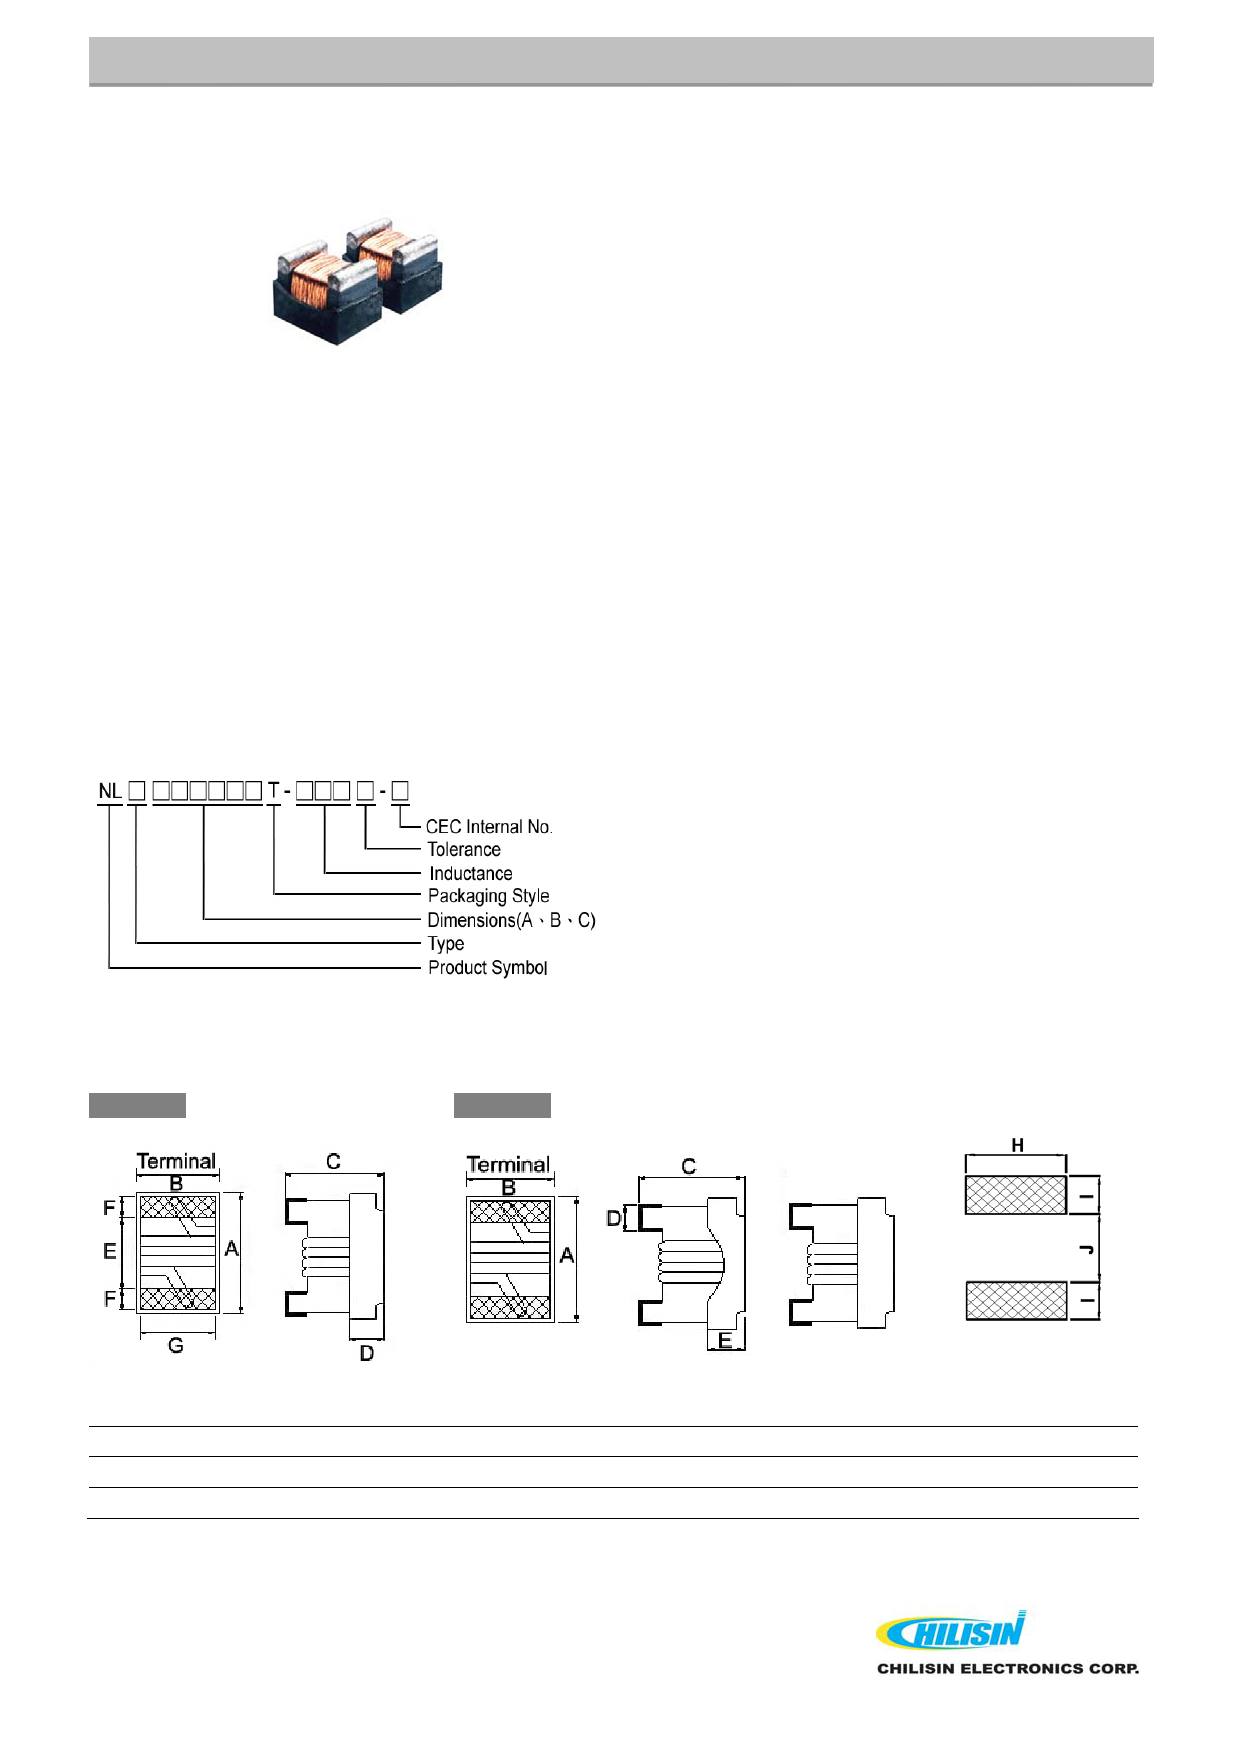 NL201614T 데이터시트 및 NL201614T PDF